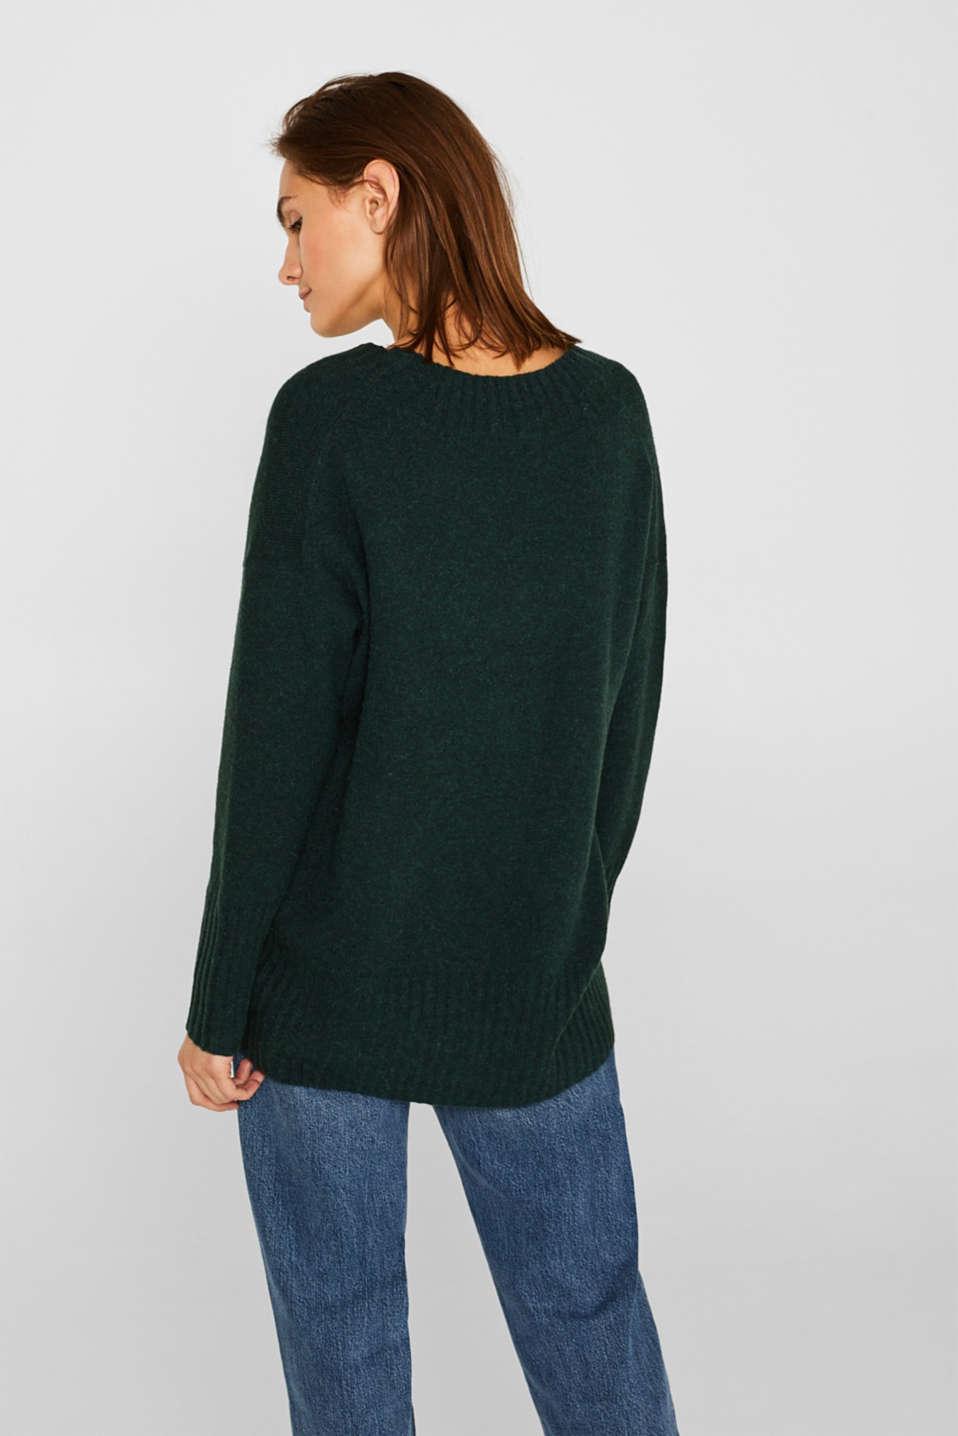 Sweaters, DARK TEAL GREEN 5, detail image number 3